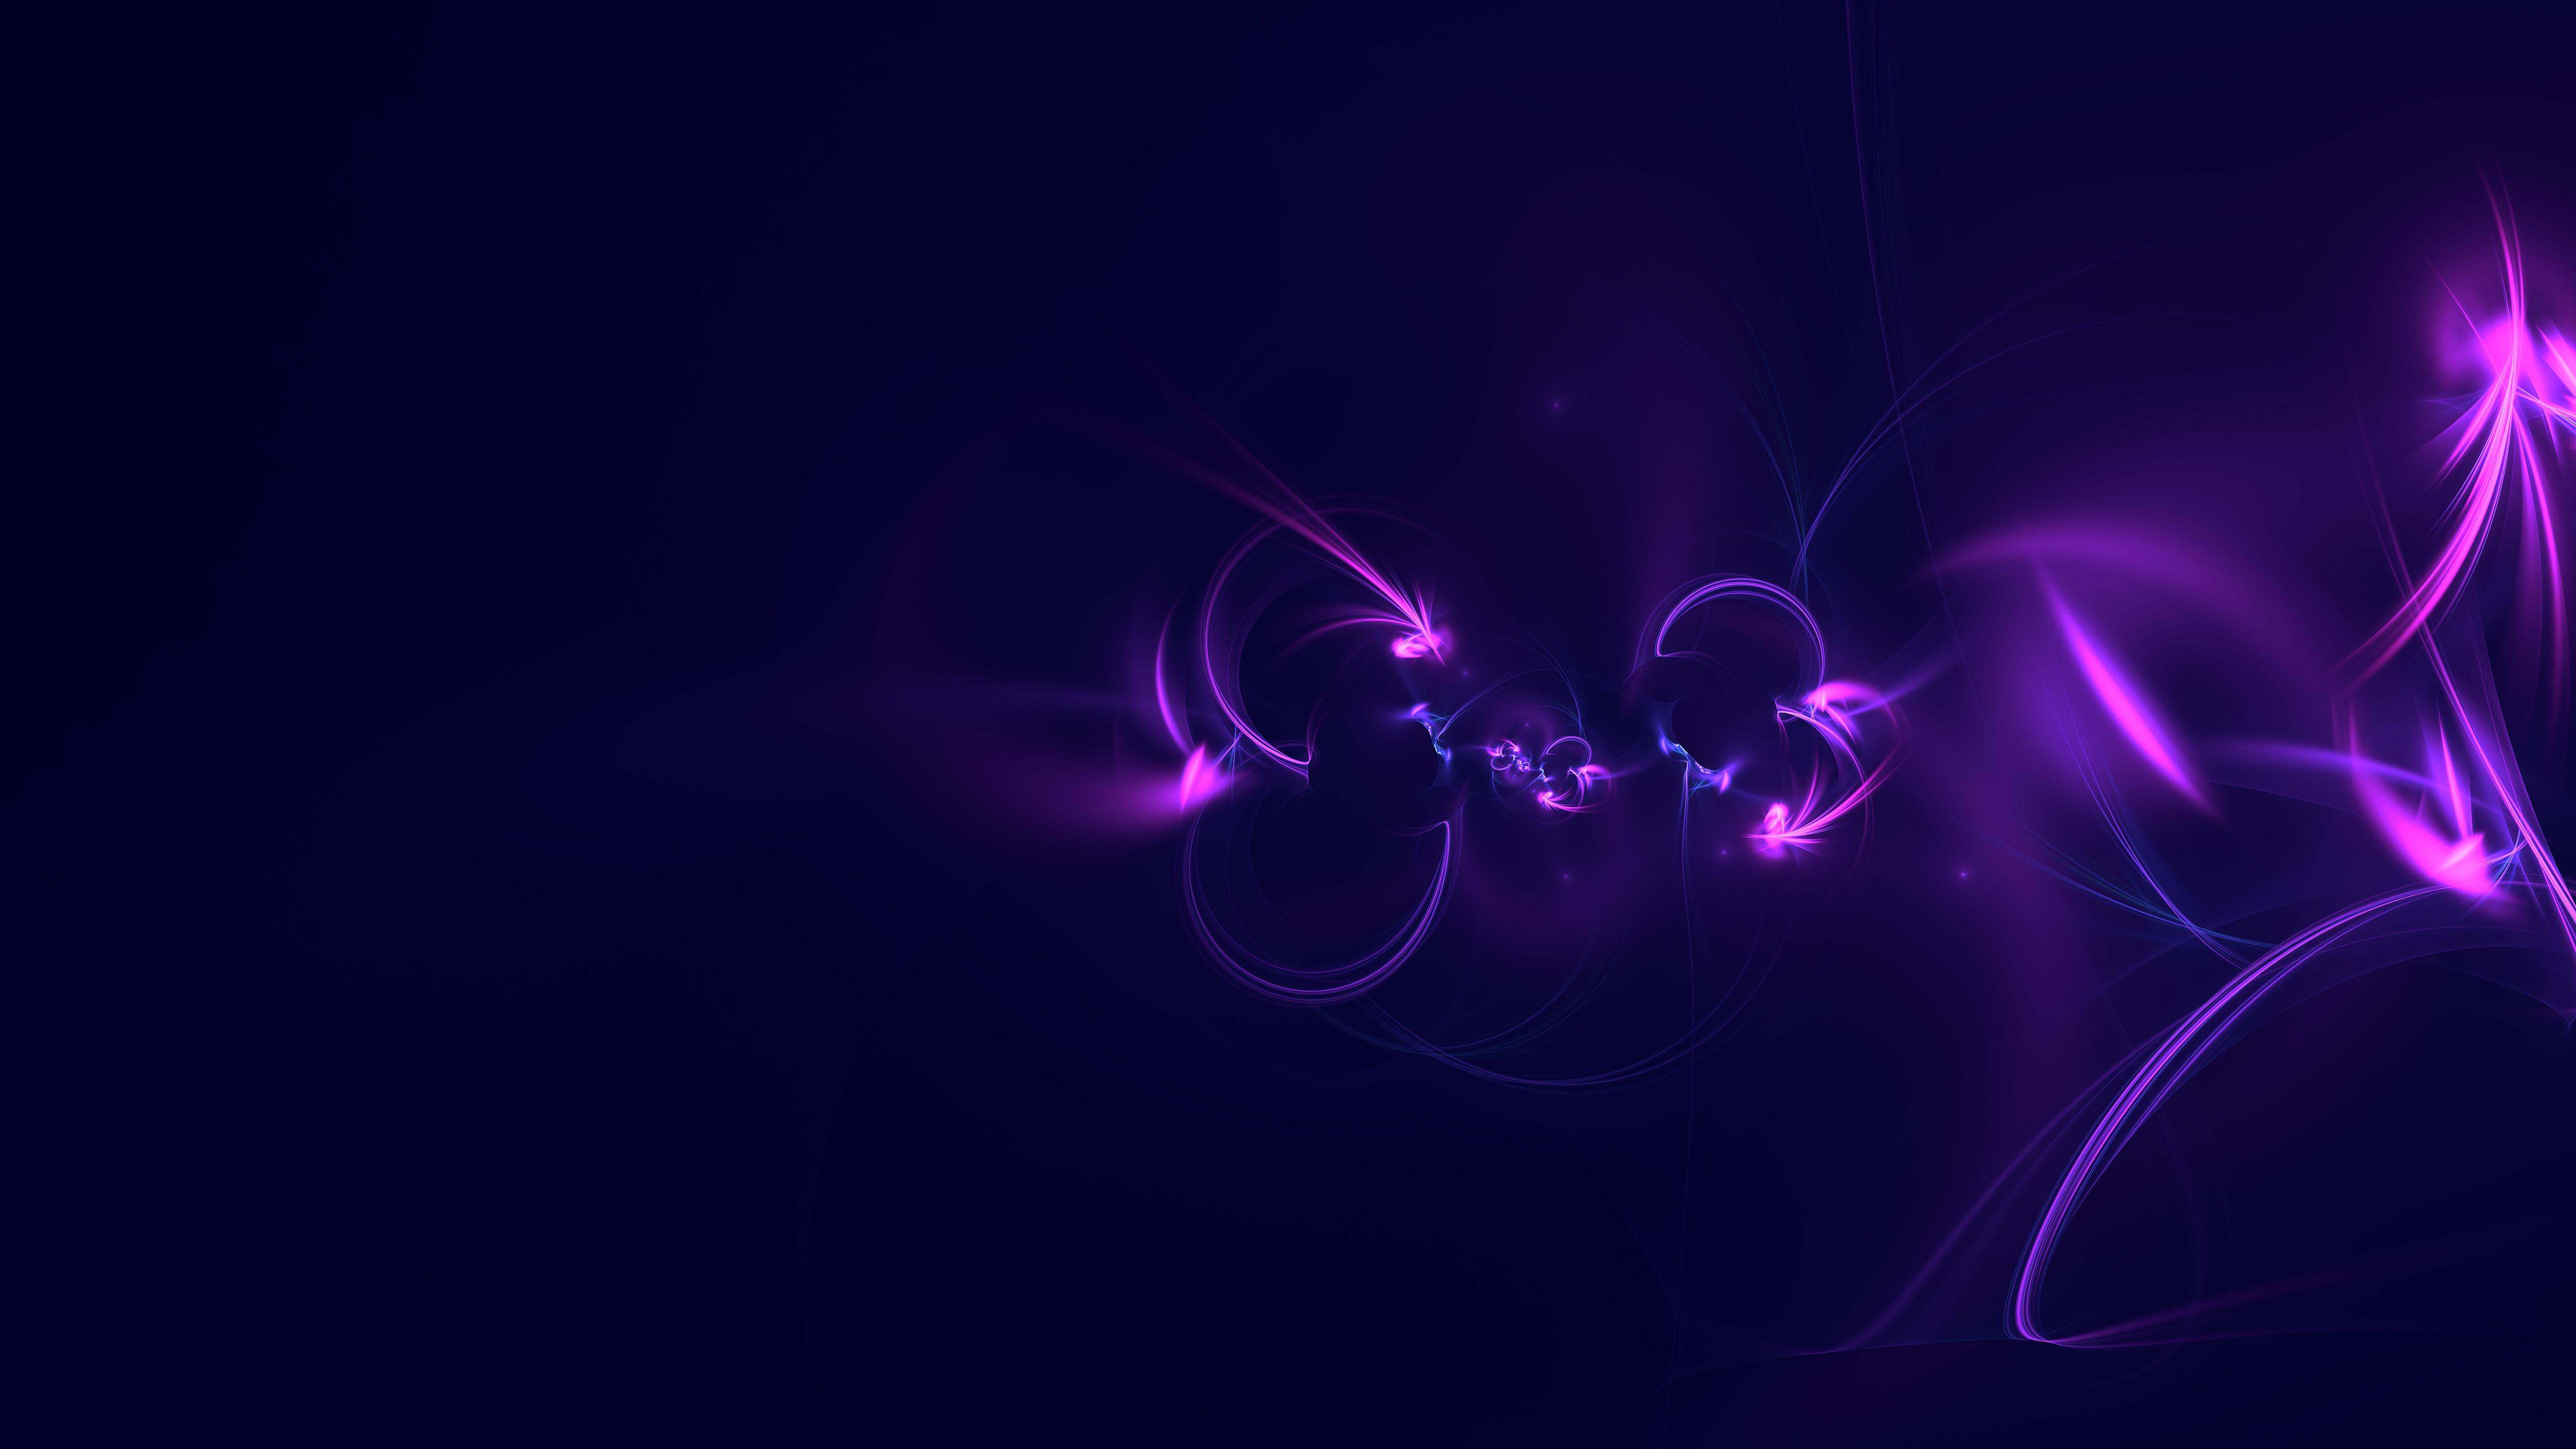 1920x1080 abstract digital art purple background 5k laptop